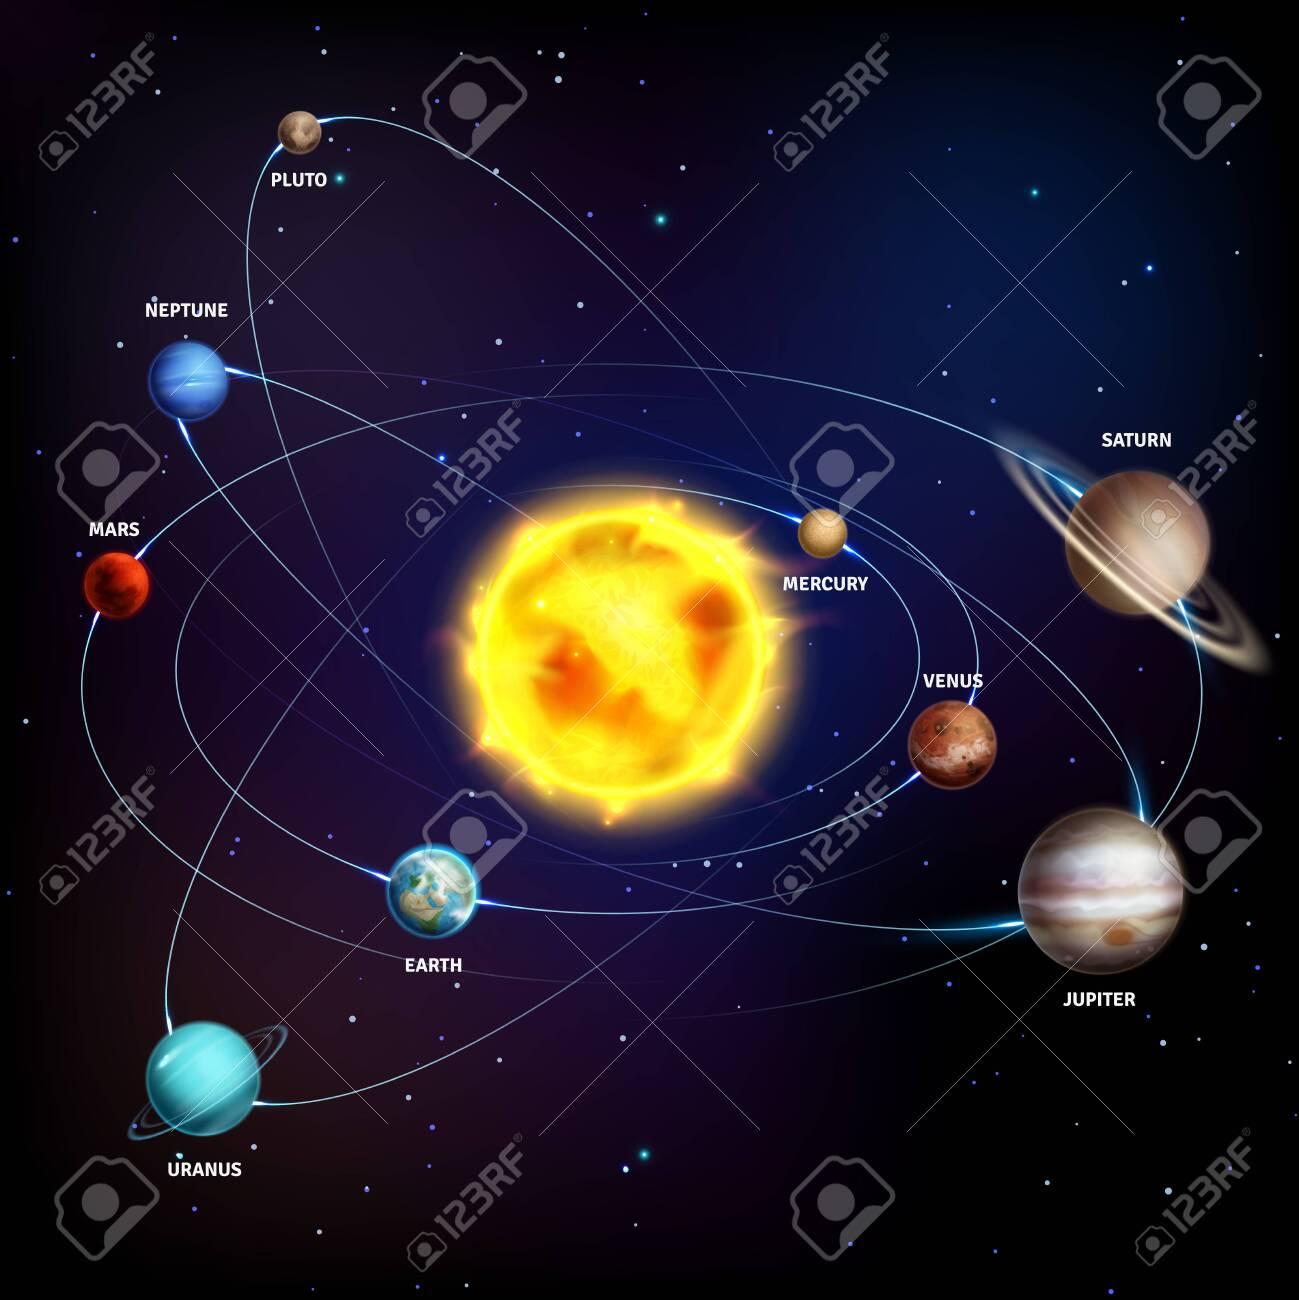 Solar system. Realistic planets space galaxy universe sun jupiter saturn mercury neptune venus uranus orbit 3d vector education cosmos poster - 122637474